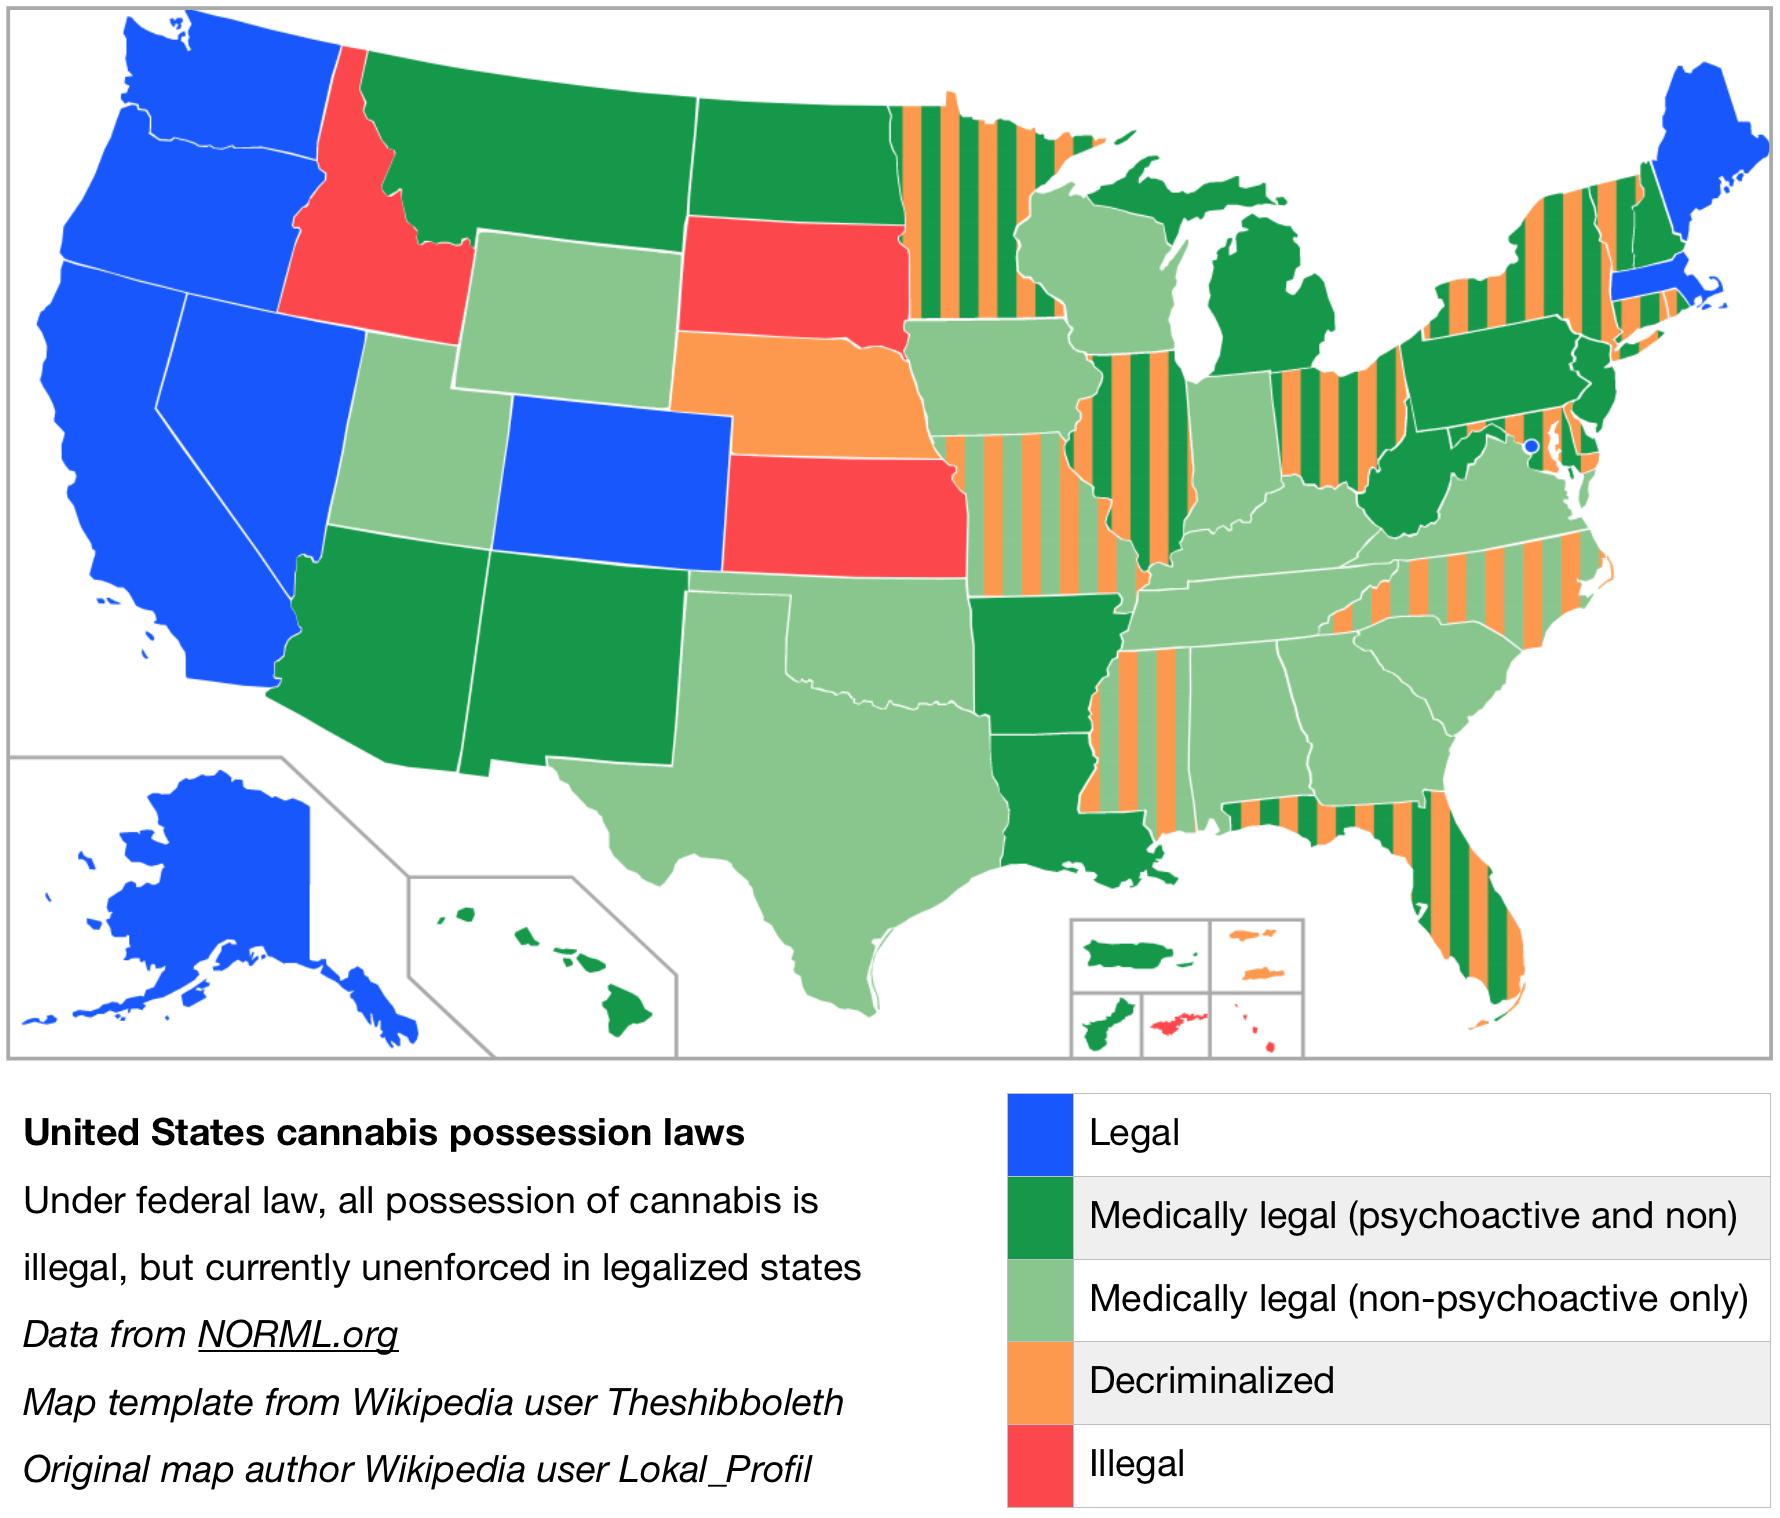 Legalizzazione Cannabis Stati Uniti I Vari Gradi Di Legalità - 2017 us marijuanna map wiki